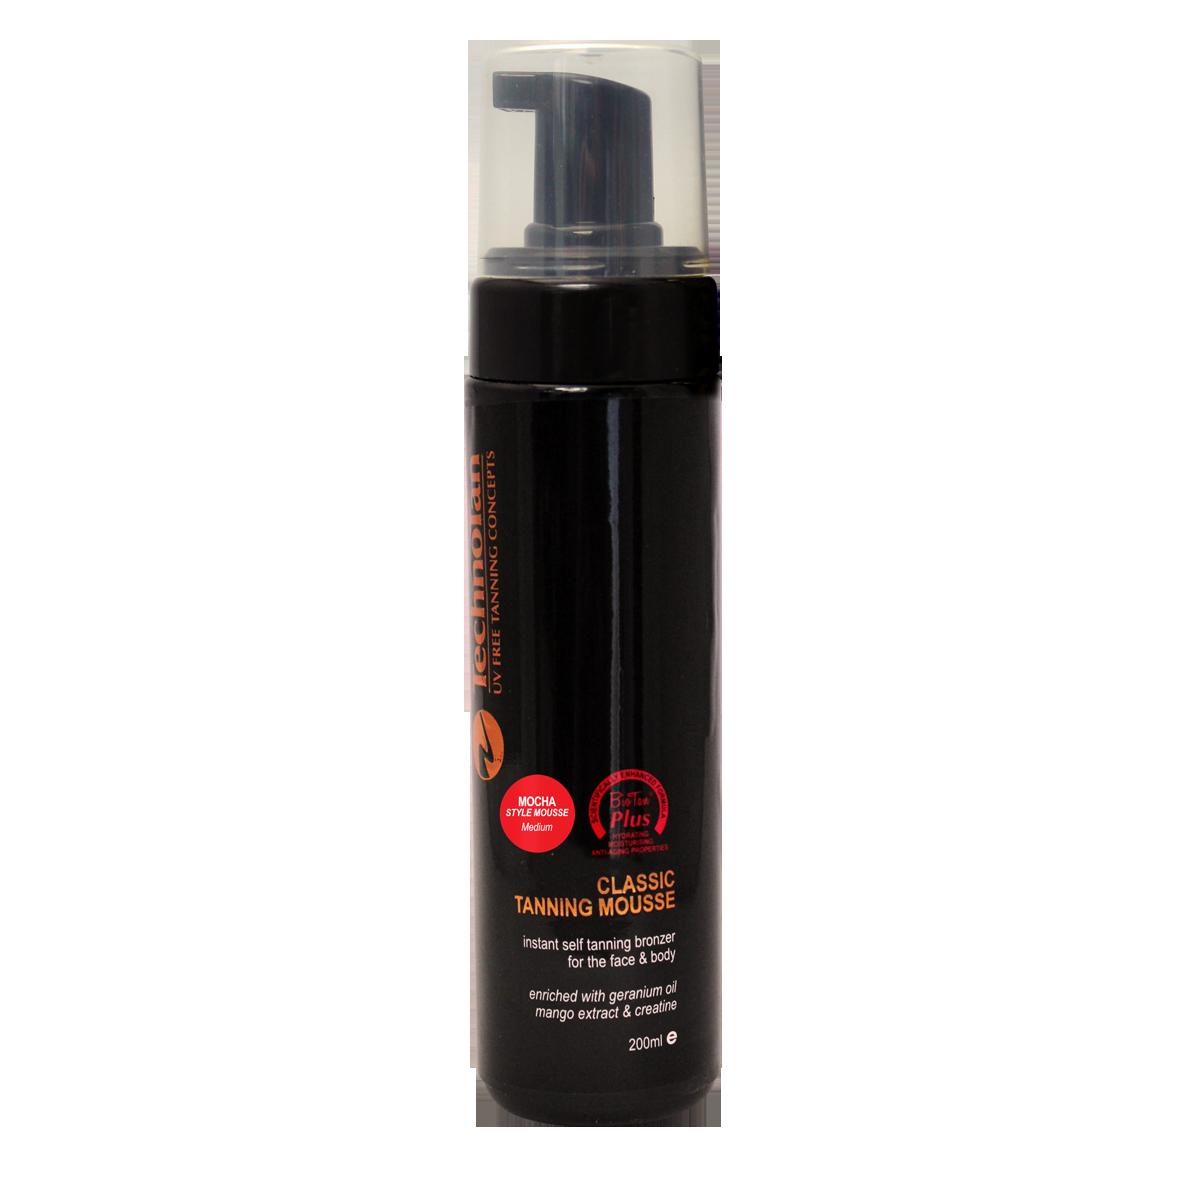 Mocha Style Tanning Mouse - 200ml (pump bottle)